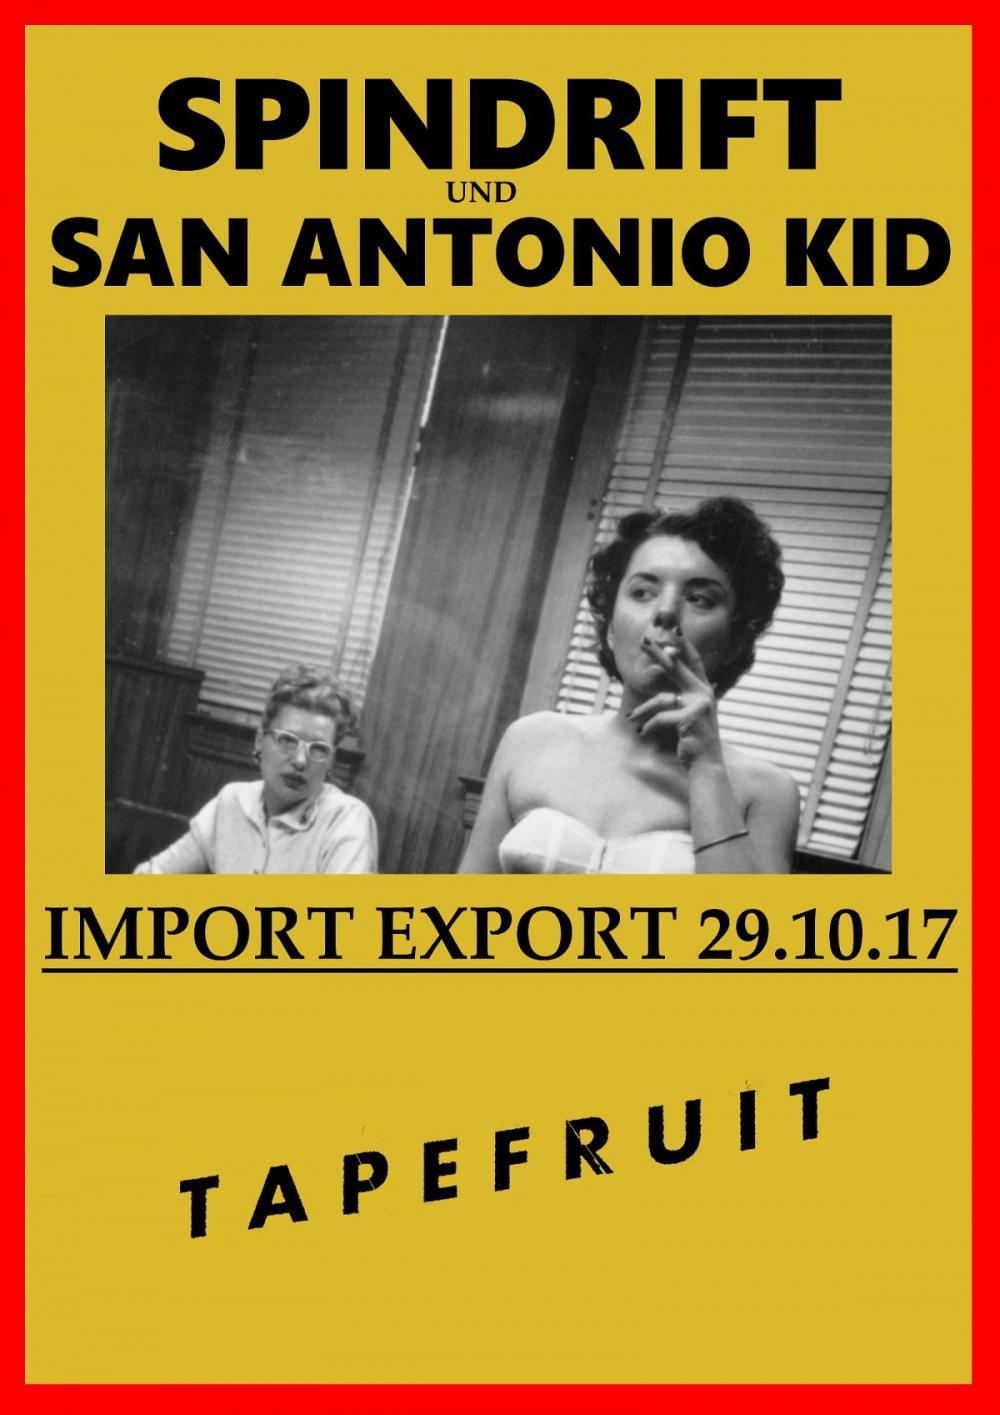 Tapefruit Konzert: Spindrift + San Antonio Kid | 29.10.2017 @ Import Export